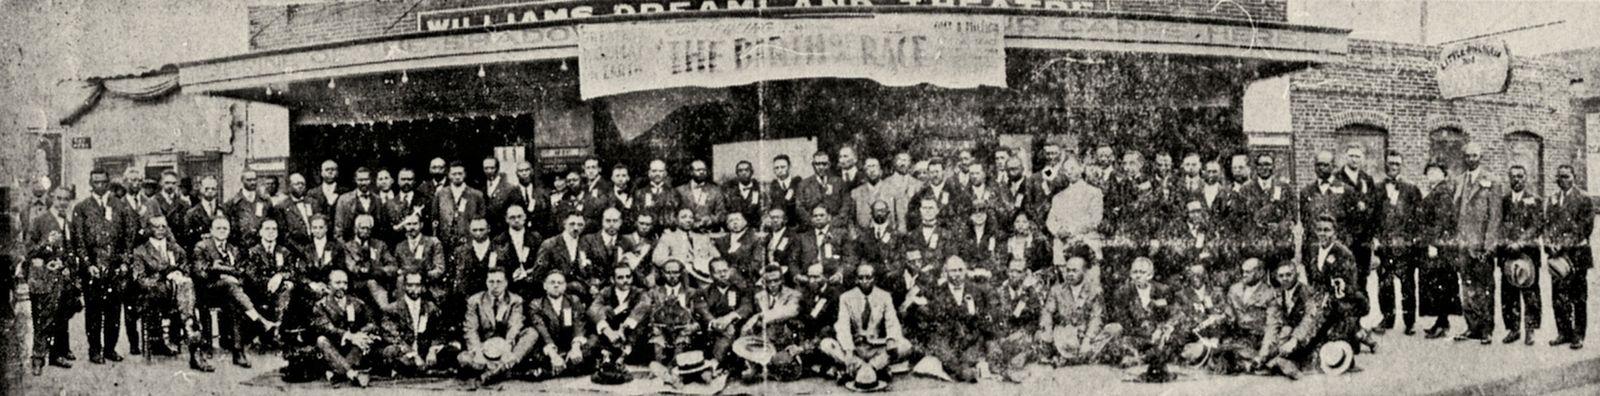 NGM Tulsa archival (Black entrepreneurs)